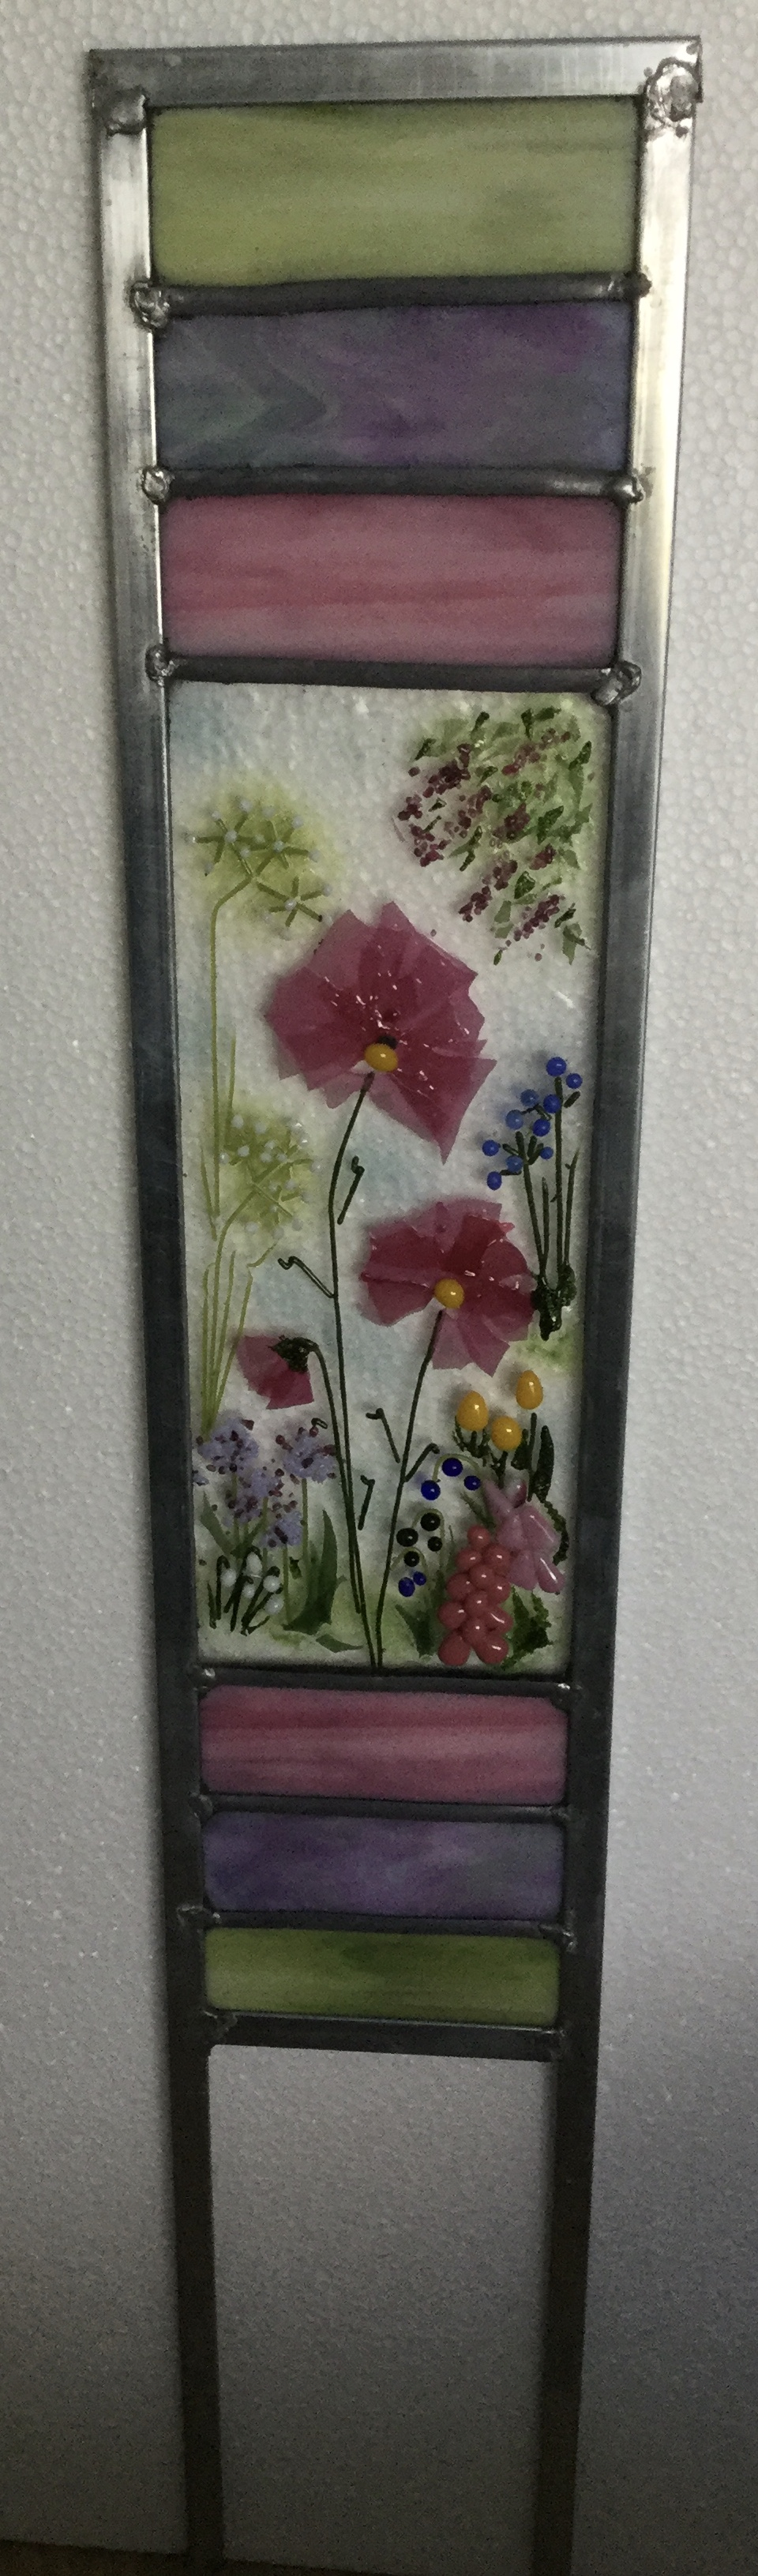 The Garden Flowers